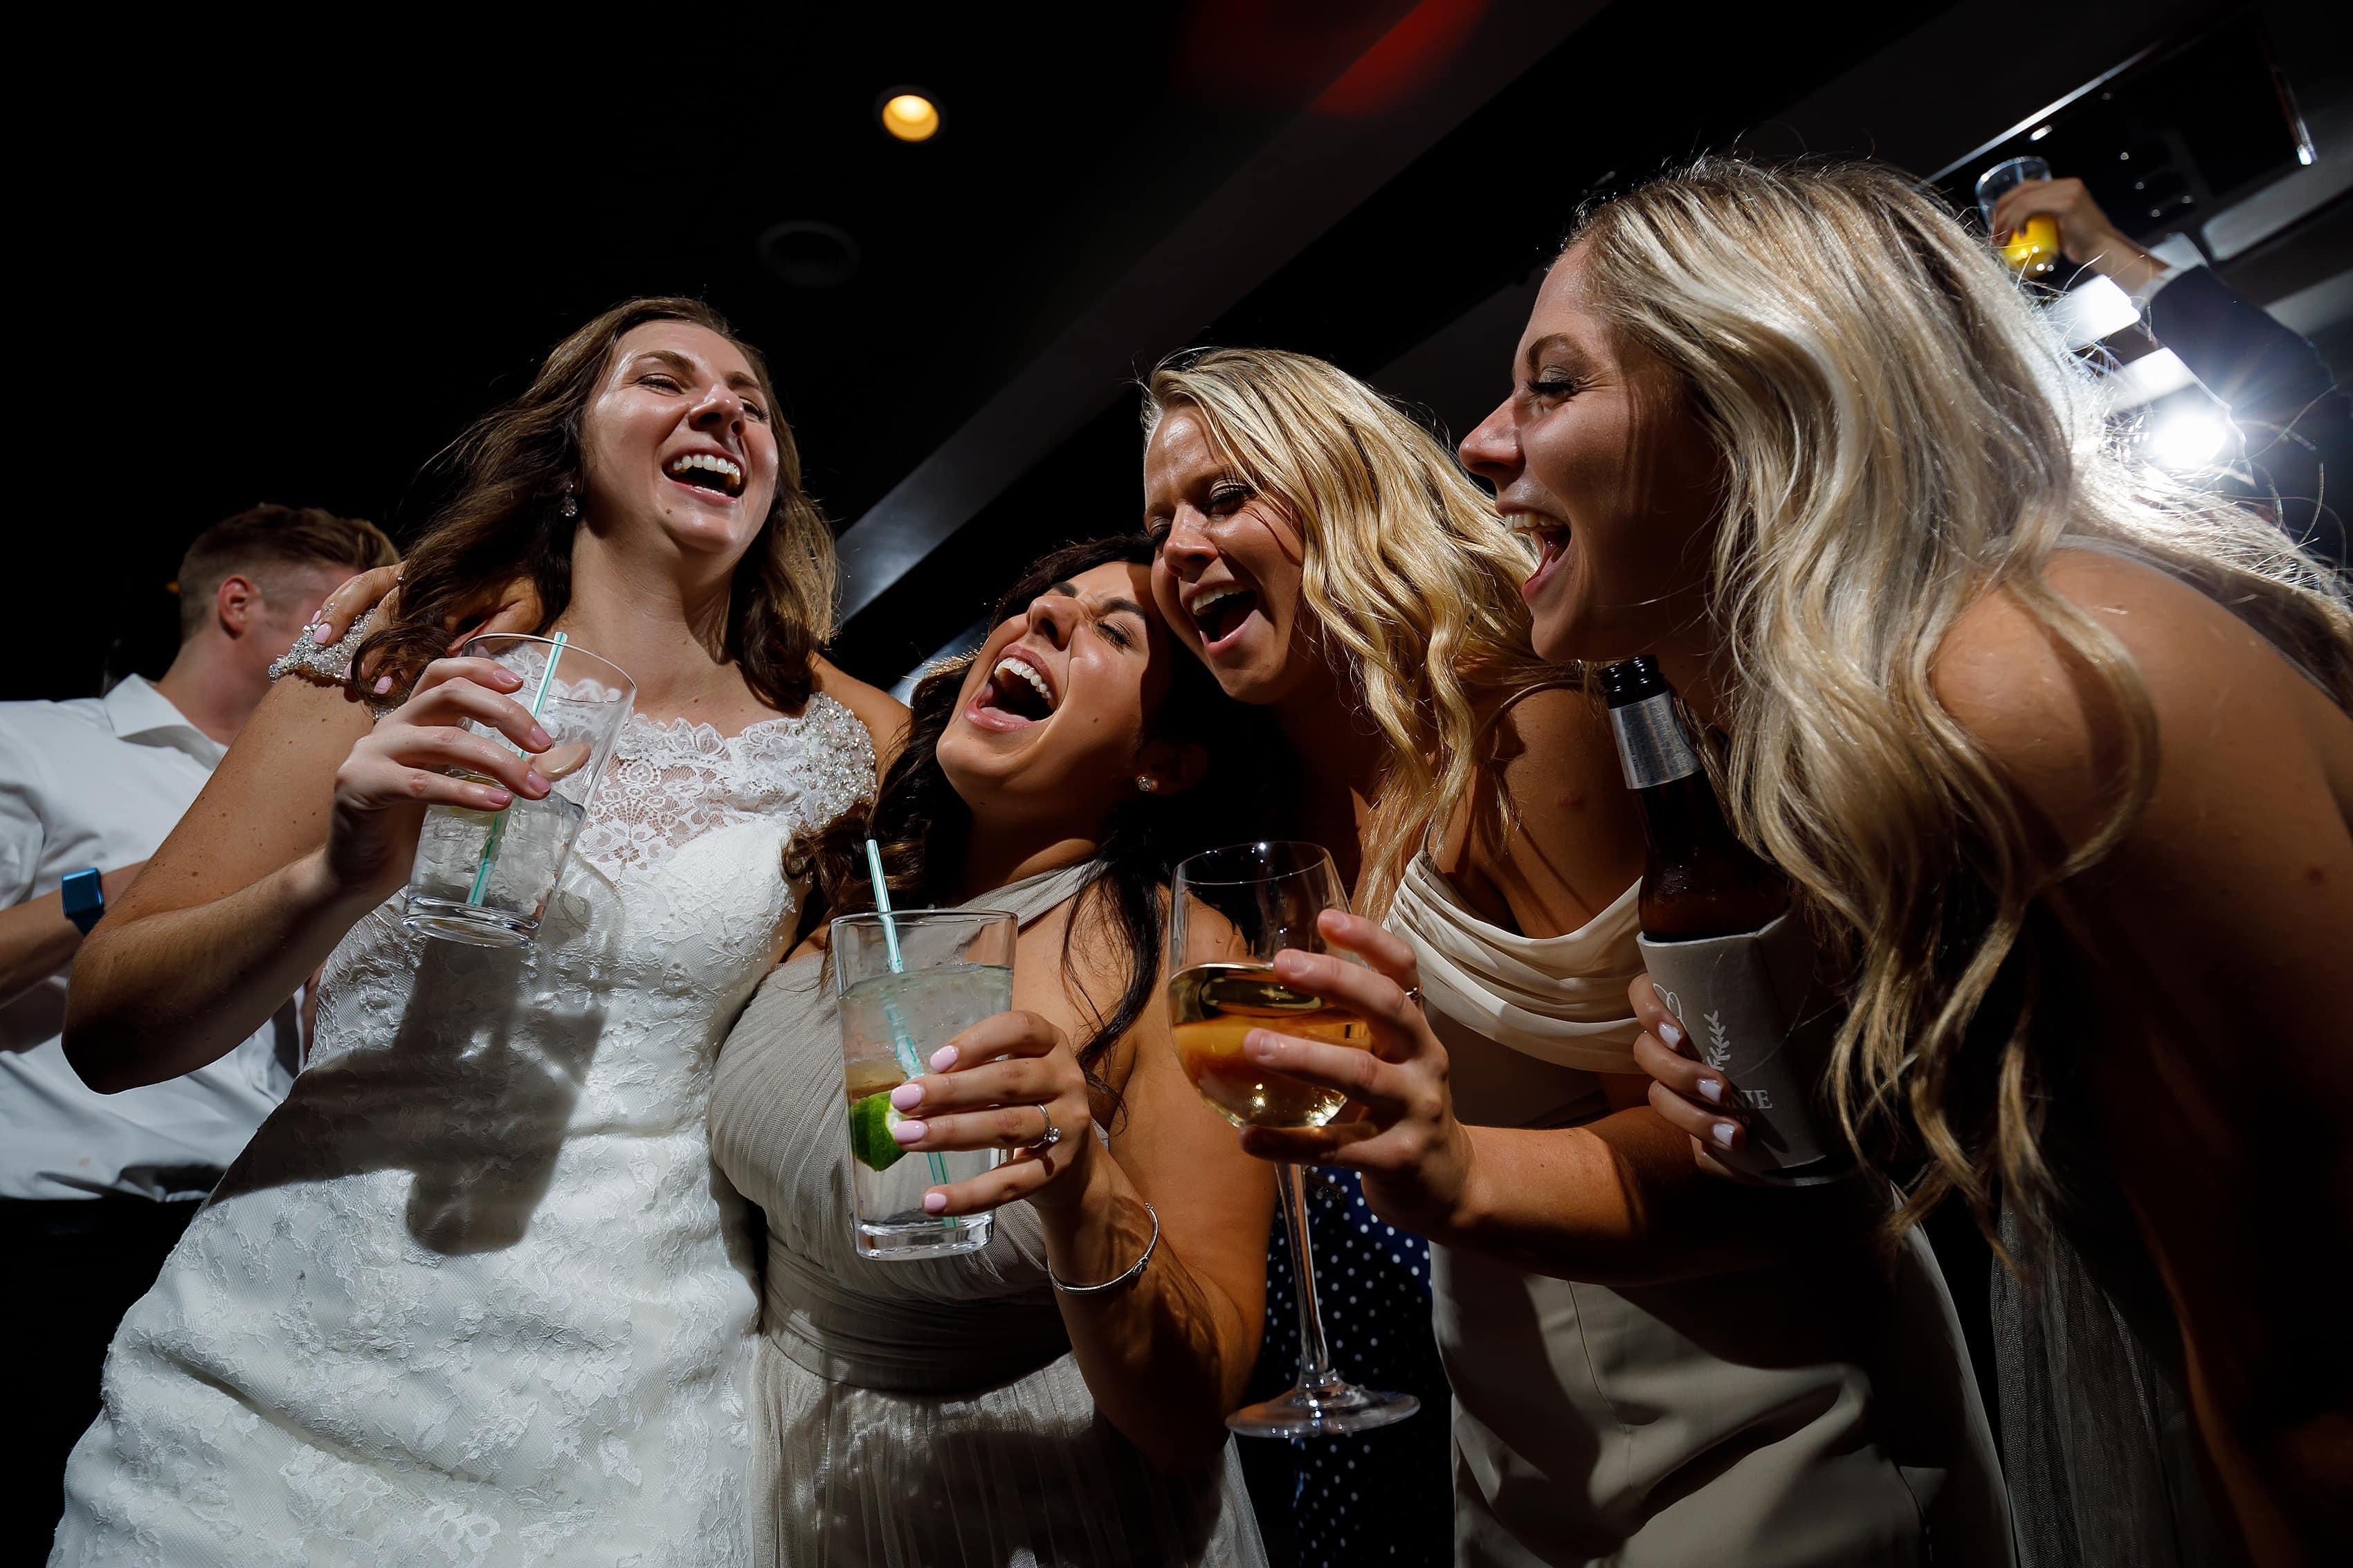 Wedding guests dance during reception at Lake Geneva Yacht Club in Lake Geneva, Wisconsin